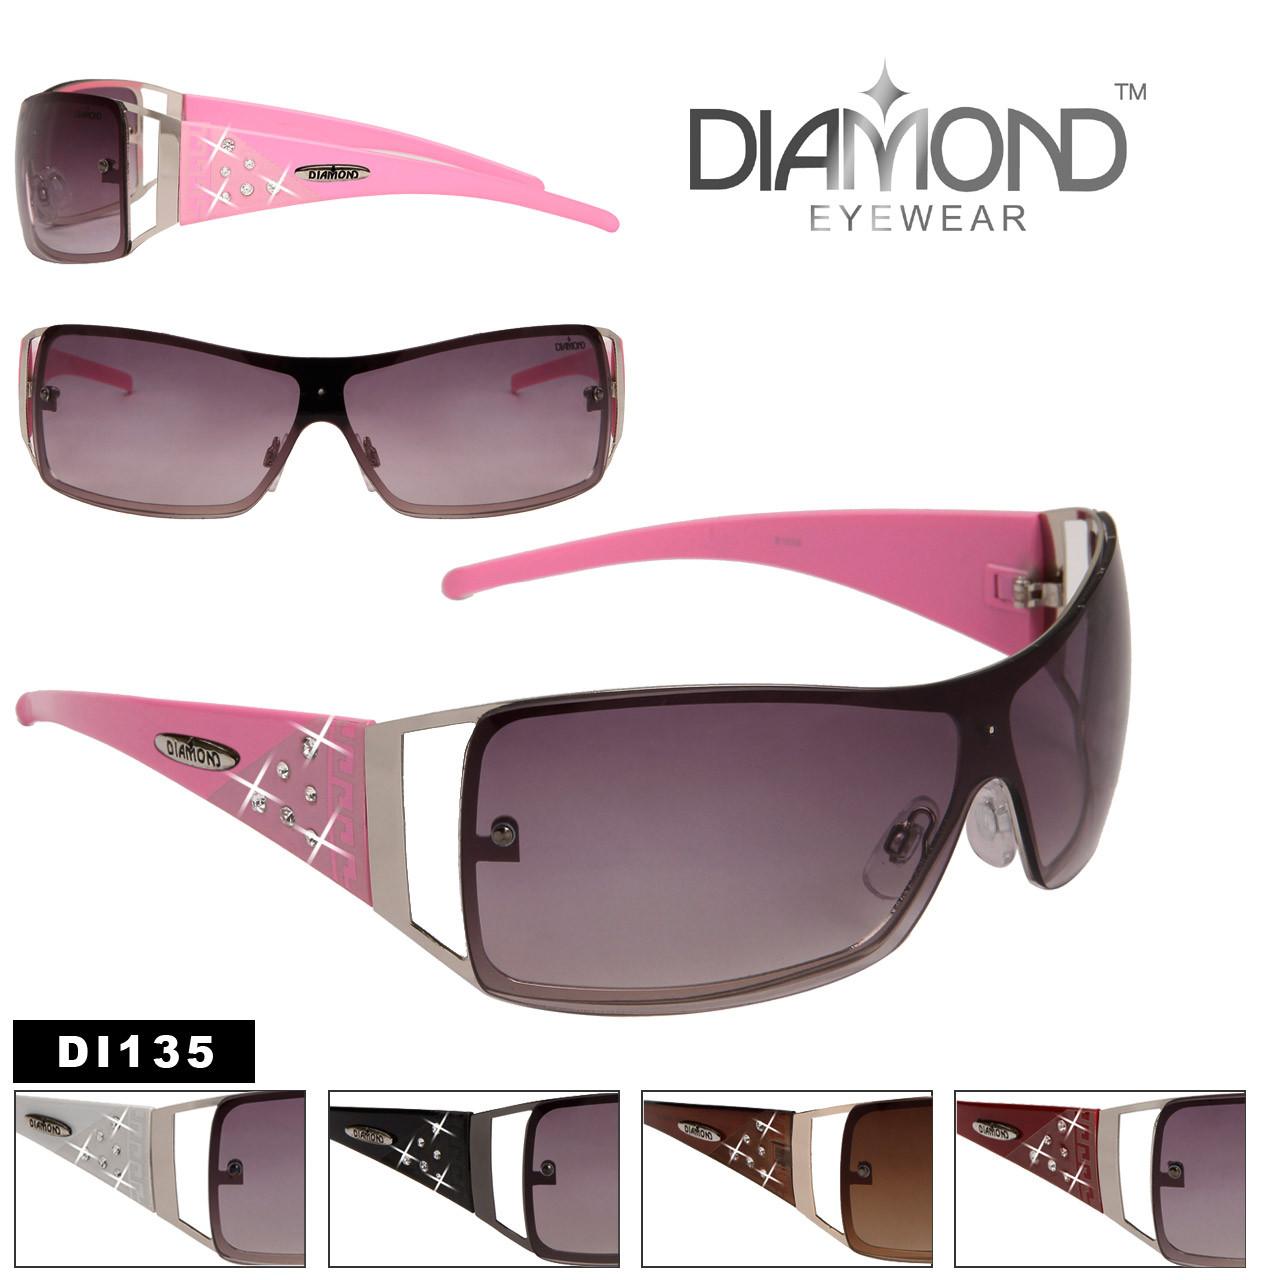 Women's Rhinestone Sunglasses DI135